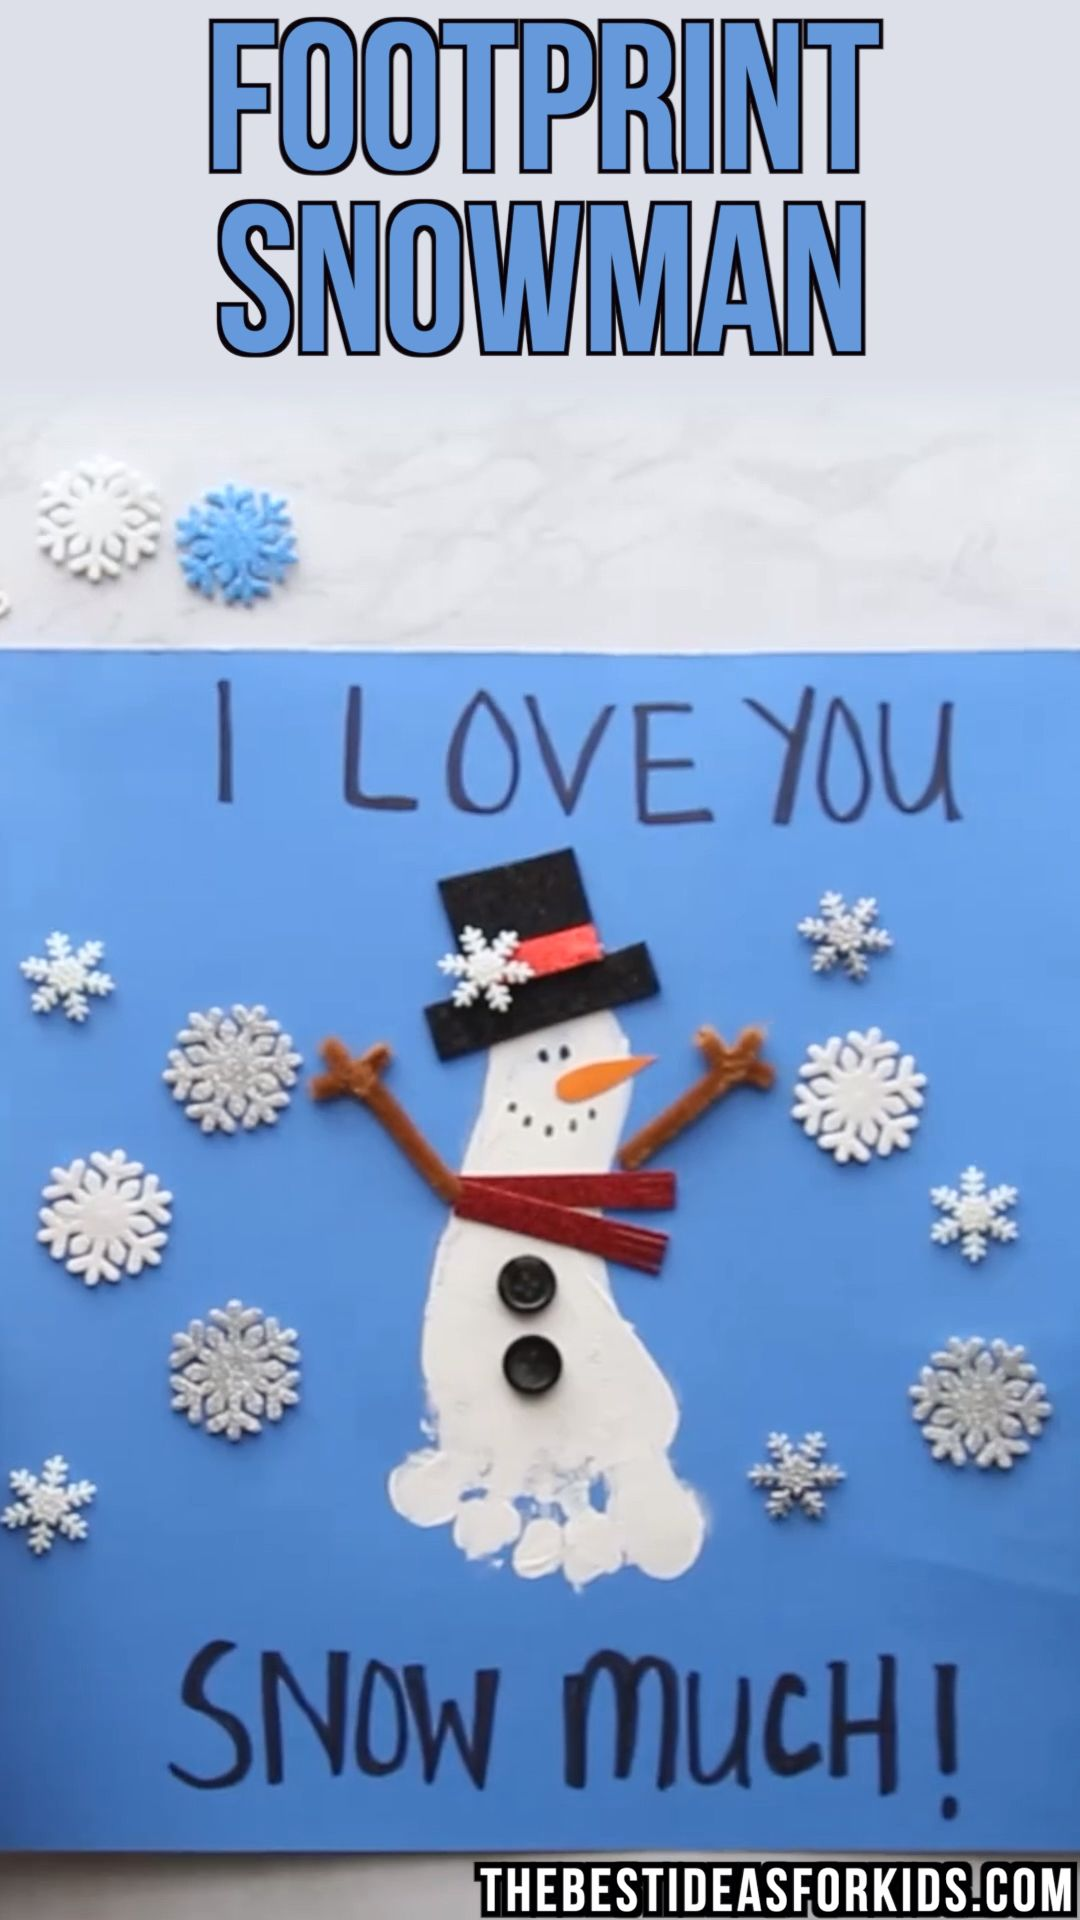 Footprint Snowman ⛄️